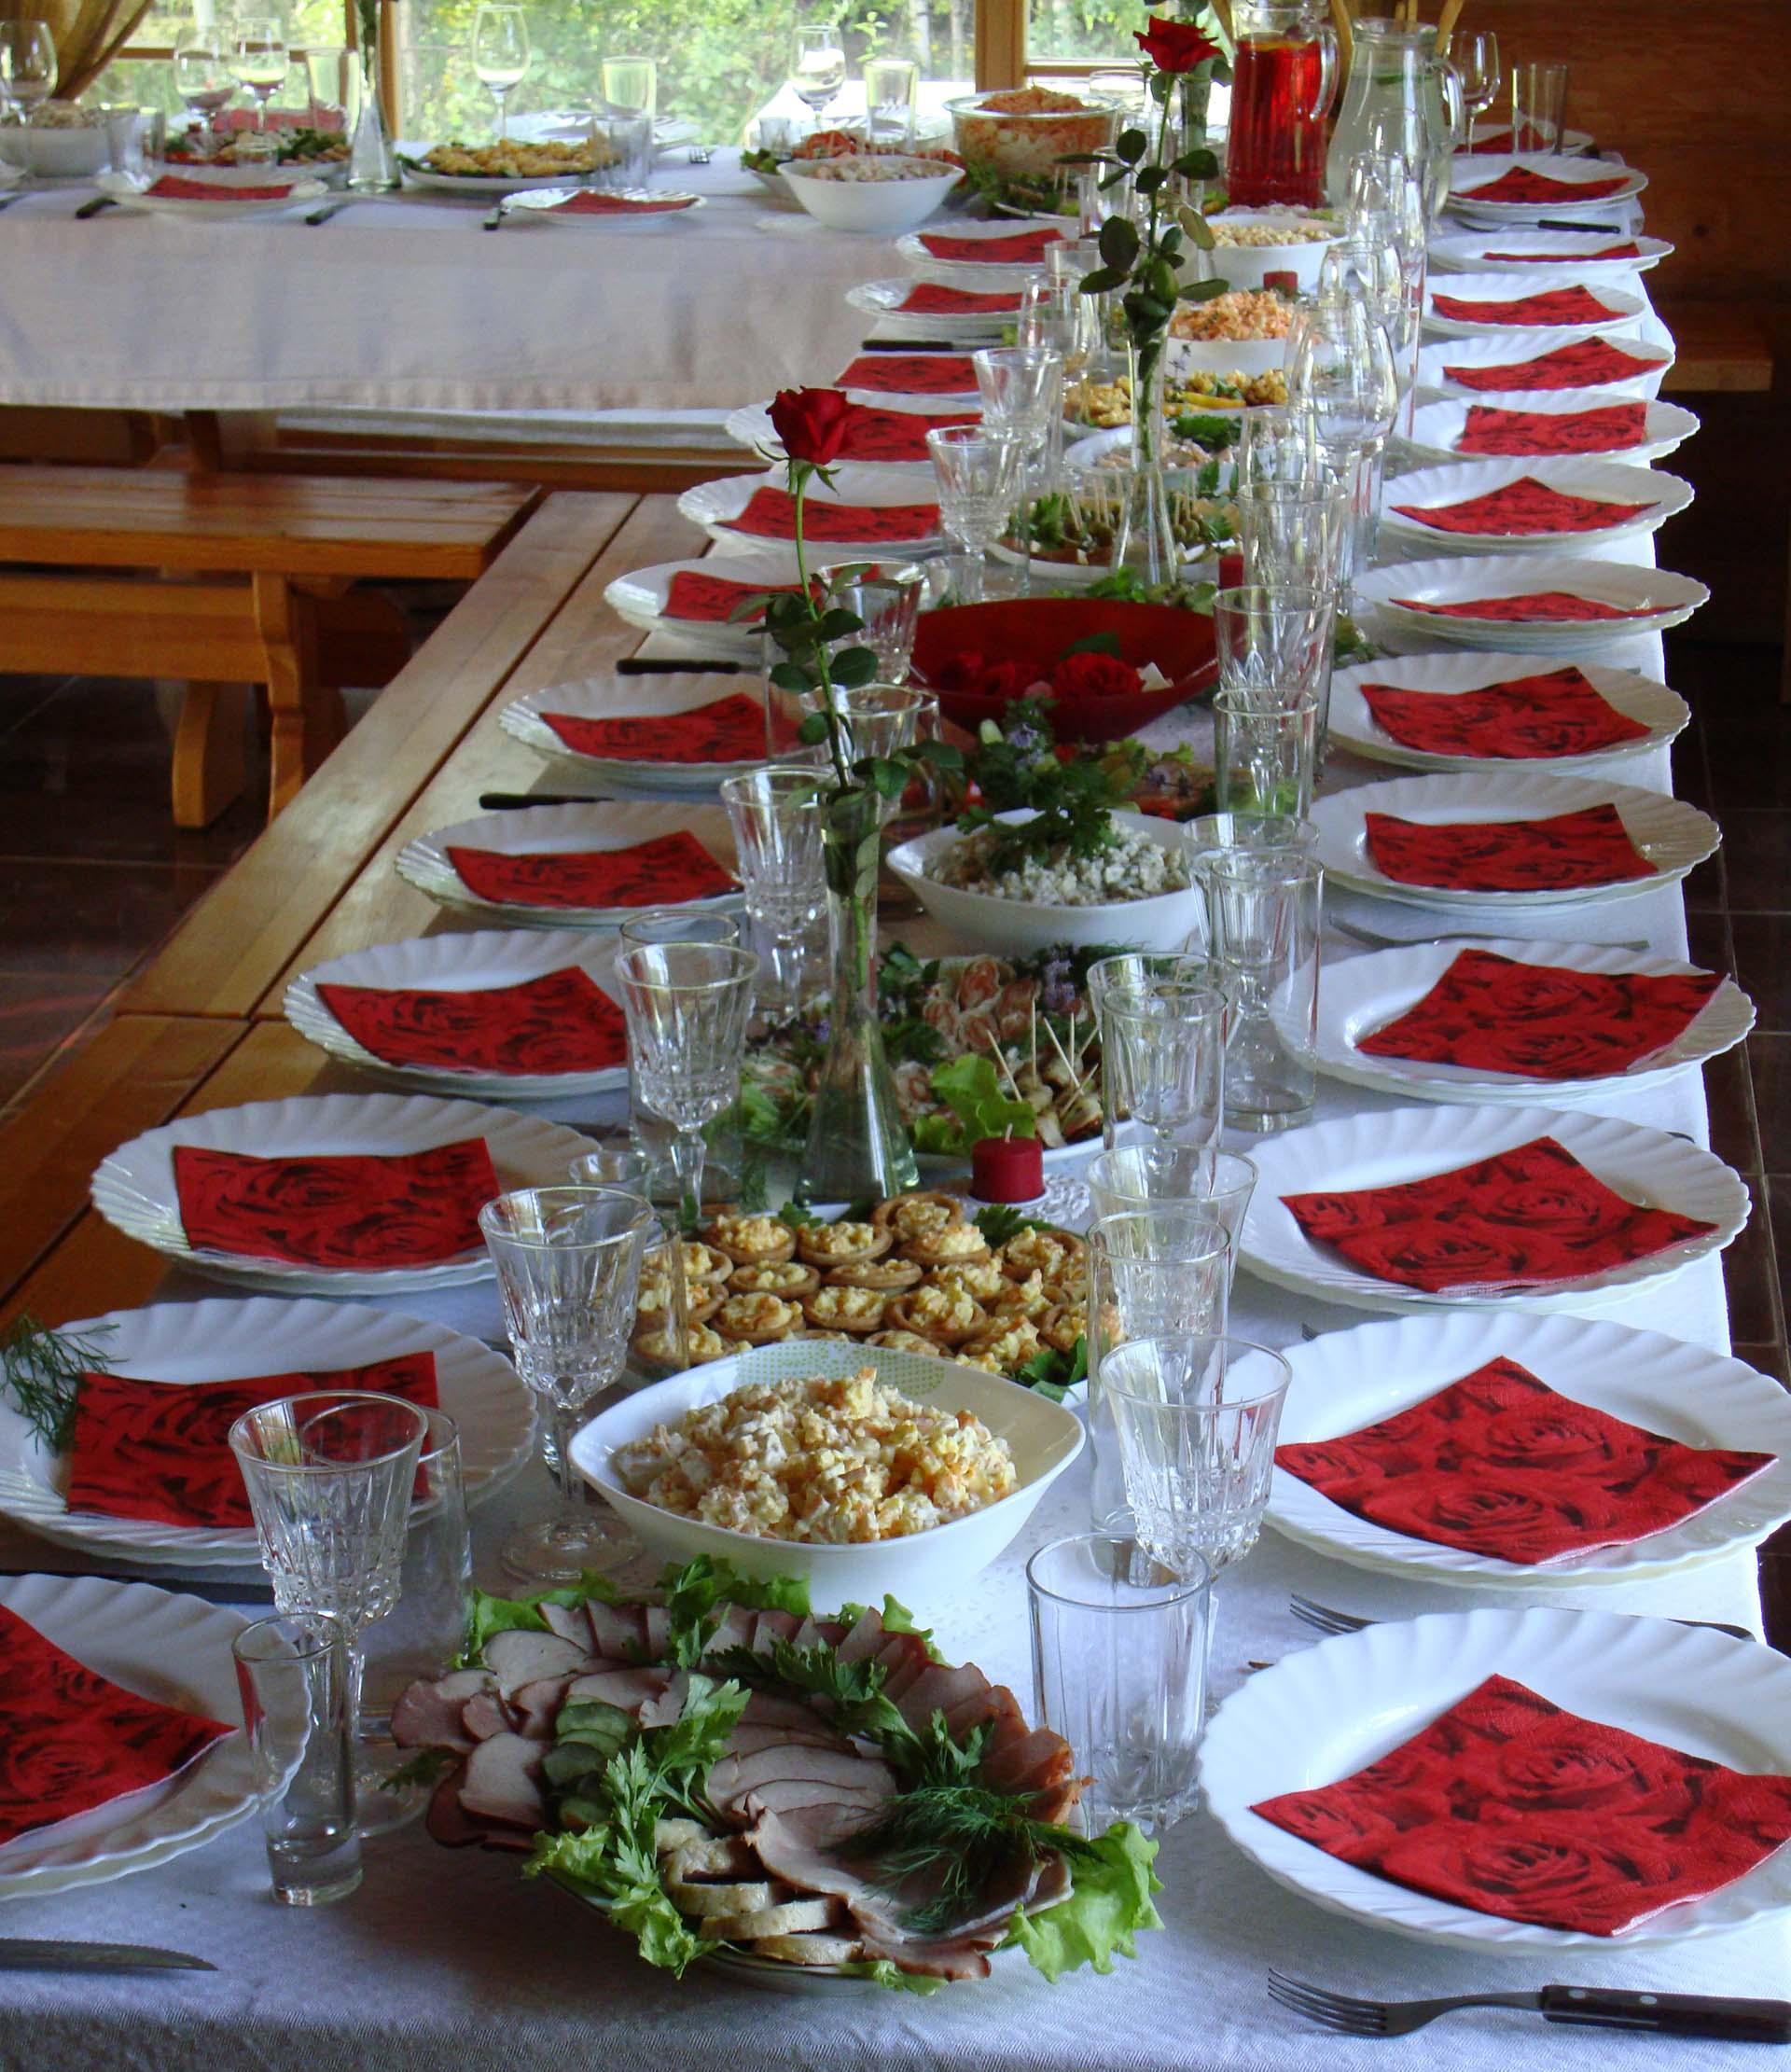 Annas-galdu-klasana